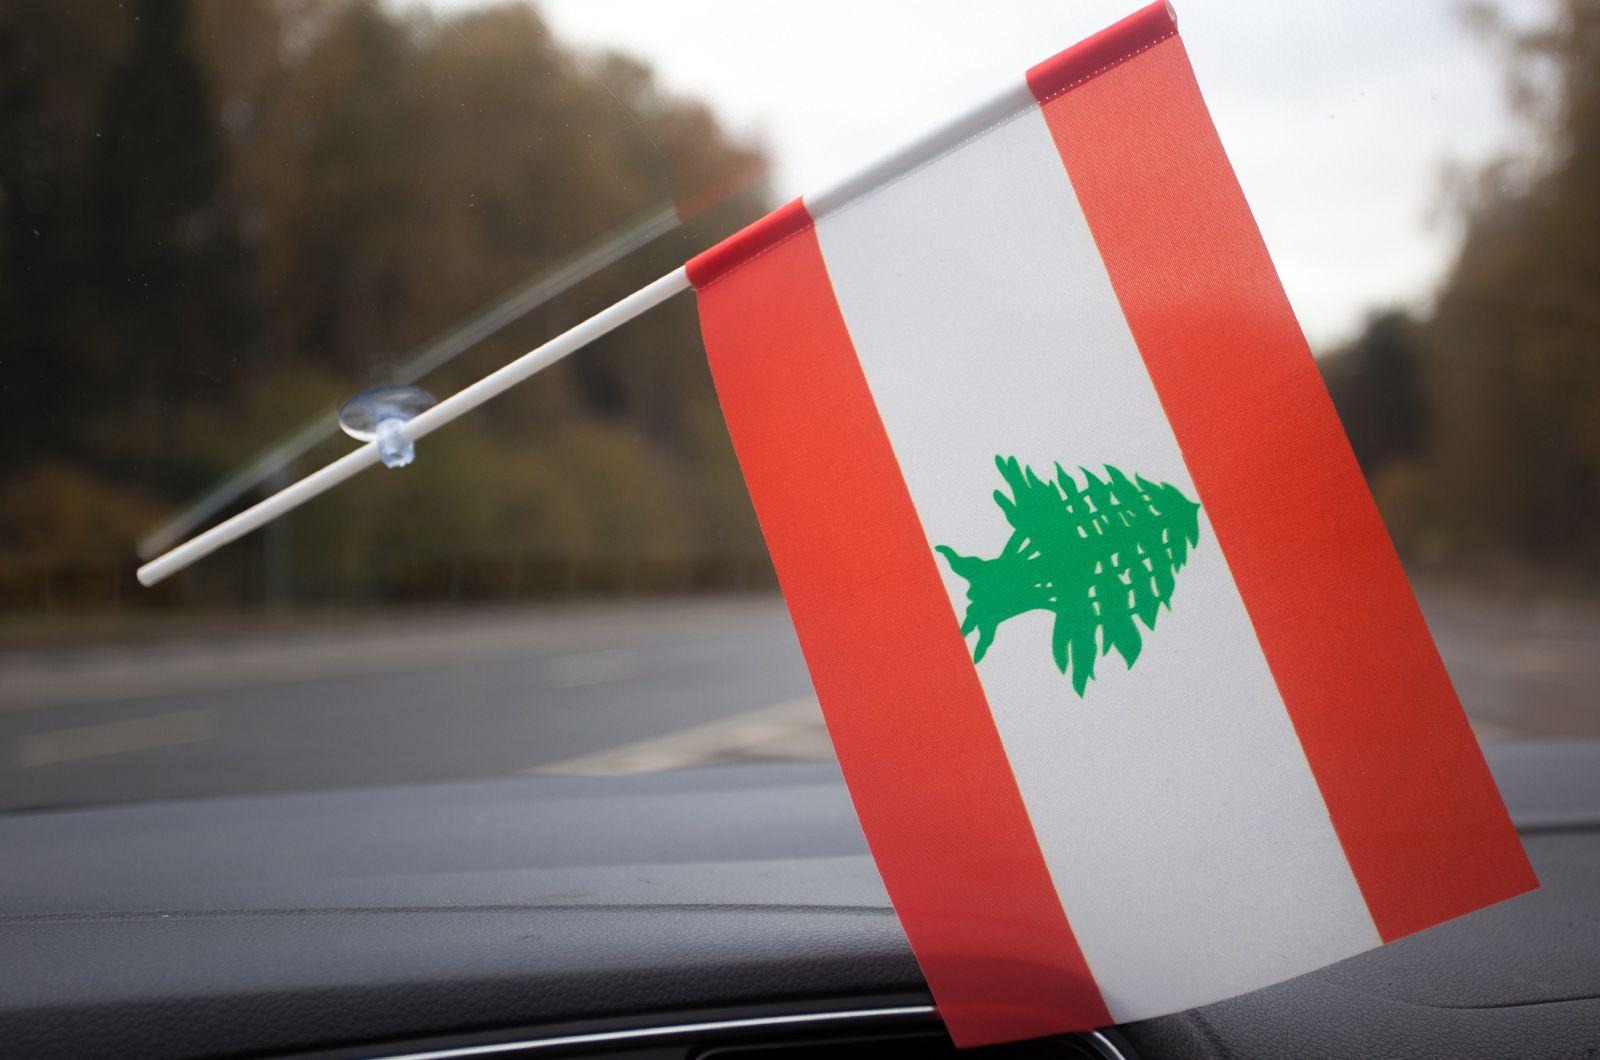 Ливанский флажок в машину